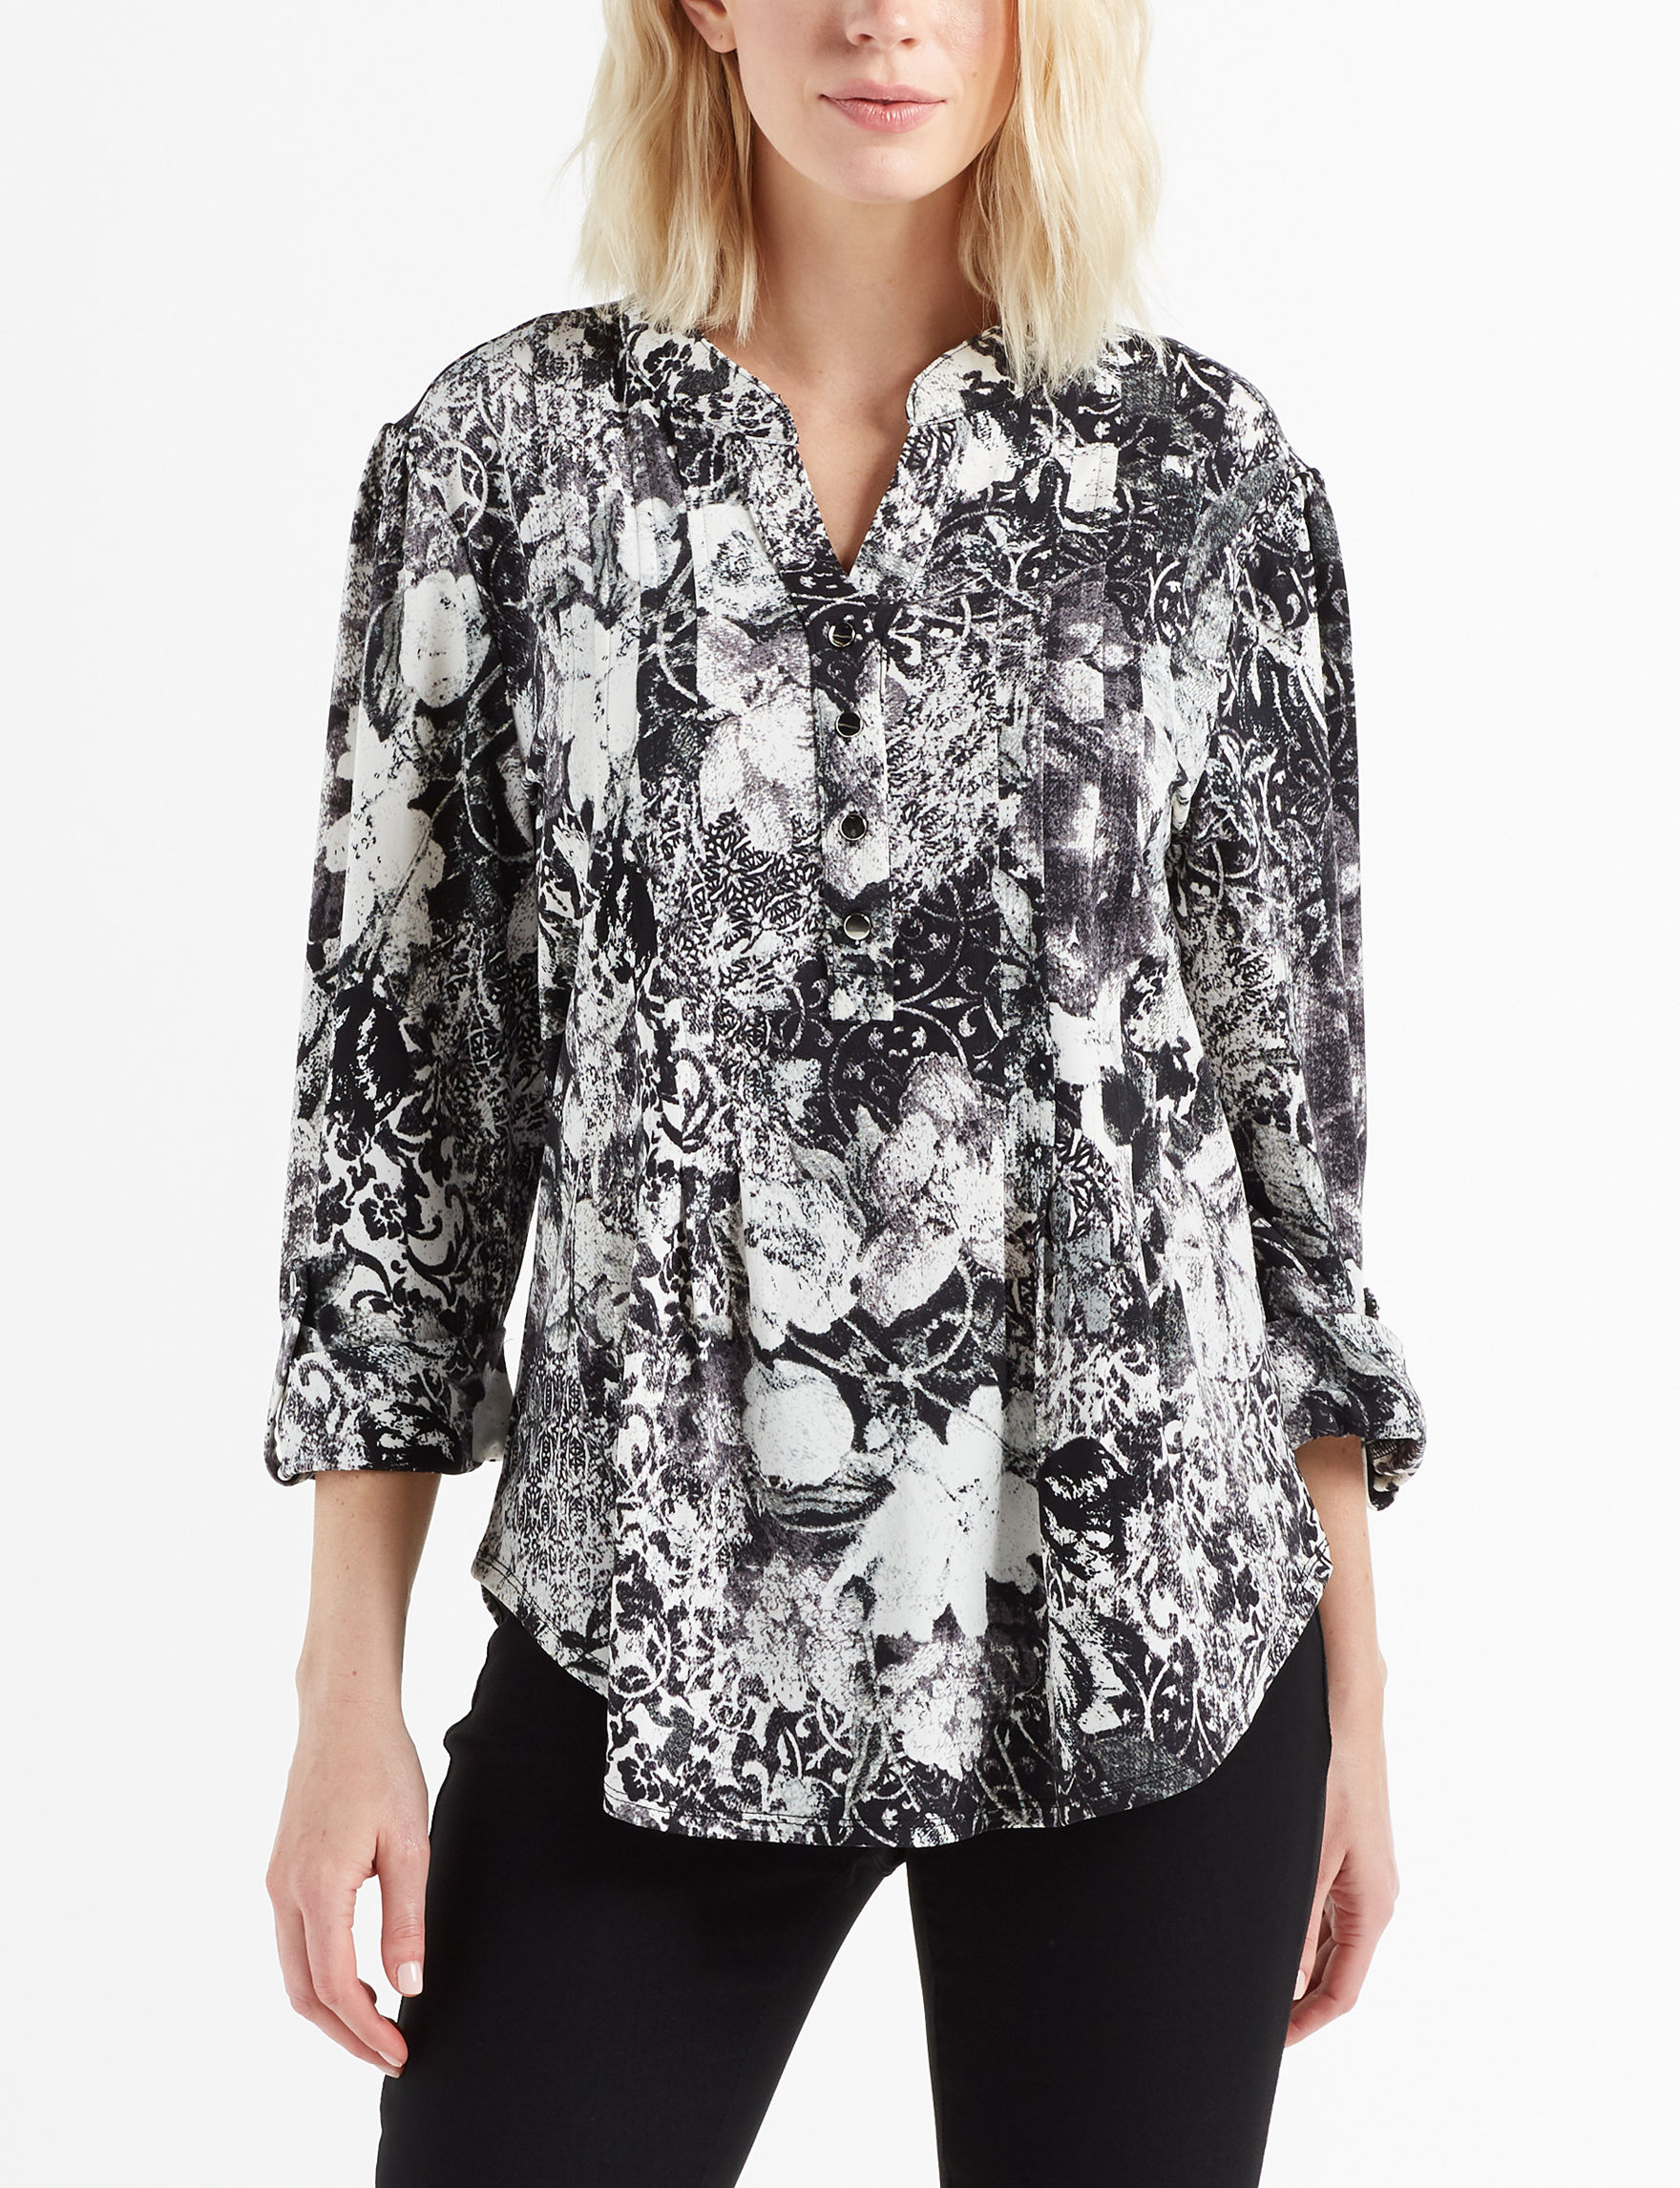 Cocomo Black /  White Shirts & Blouses